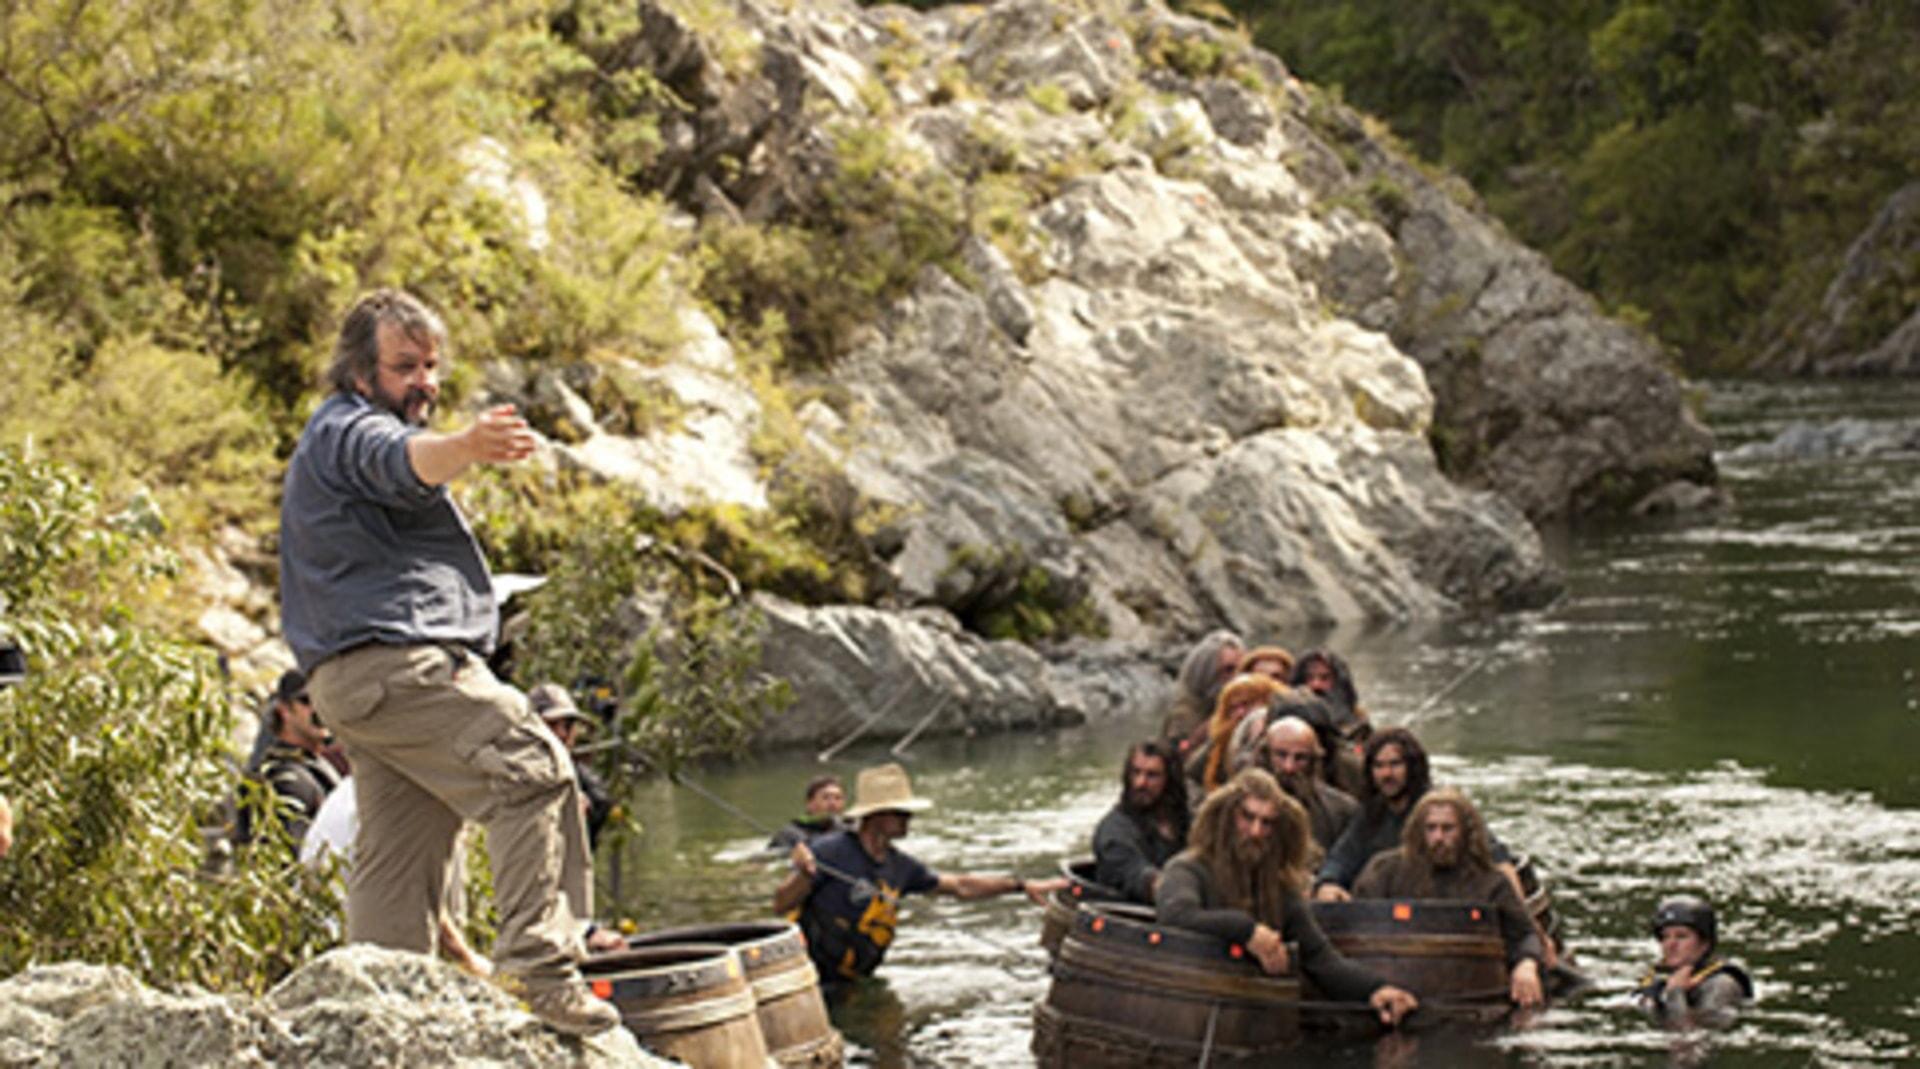 The Hobbit: The Desolation of Smaug - Image 6